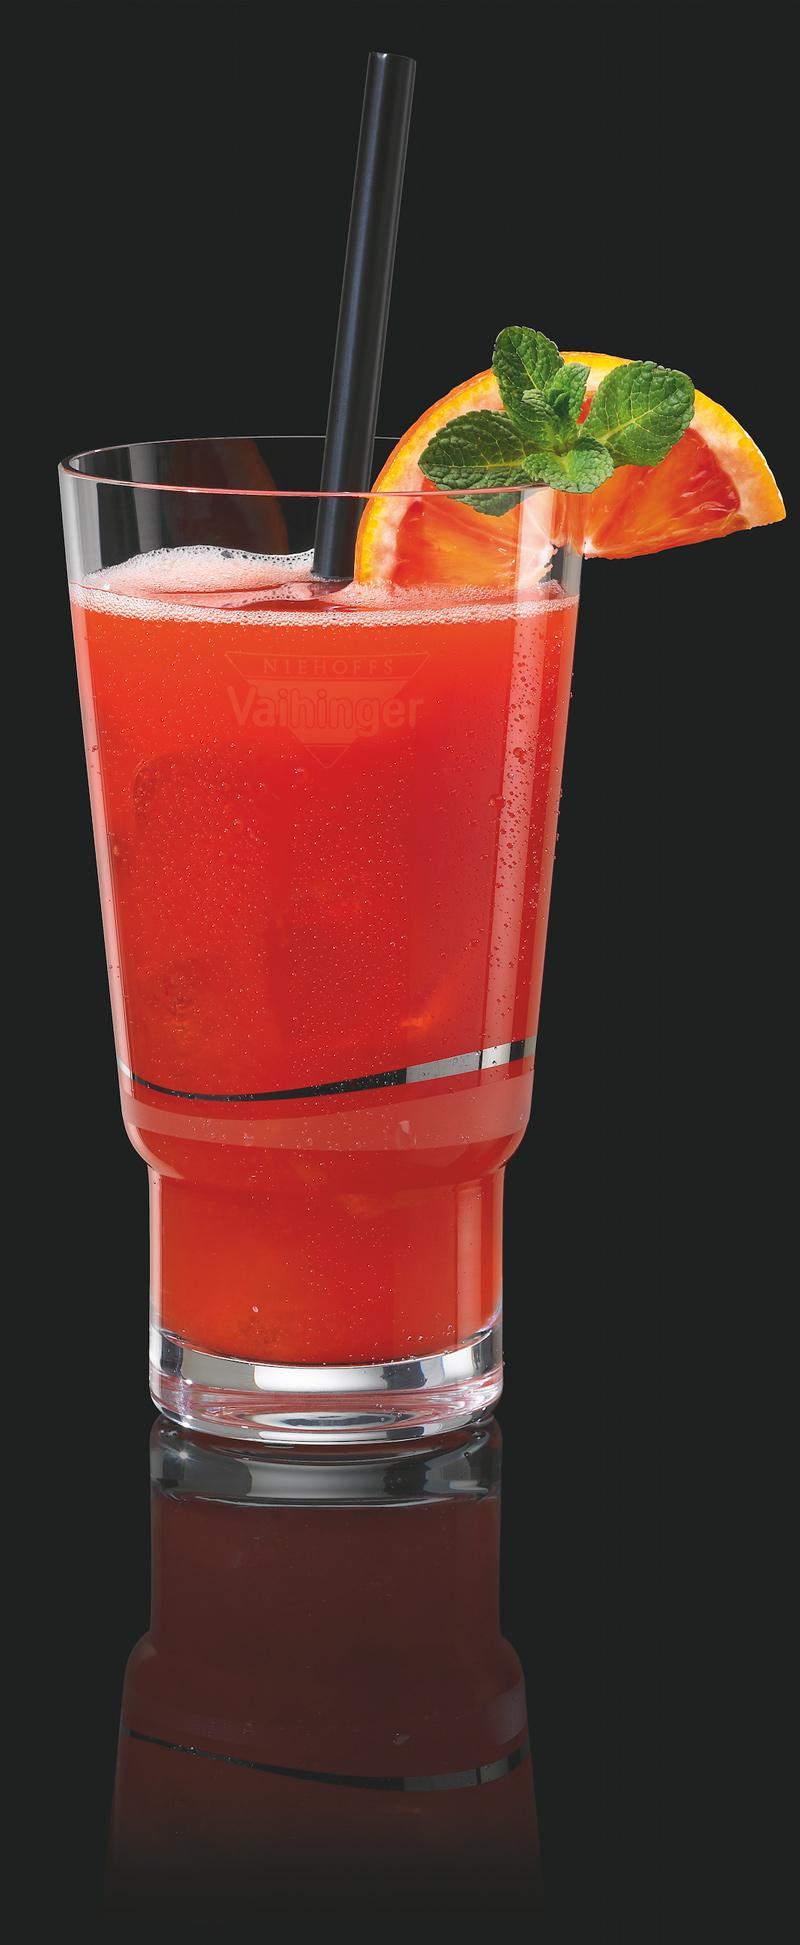 Vaihinger Saft-Cocktail